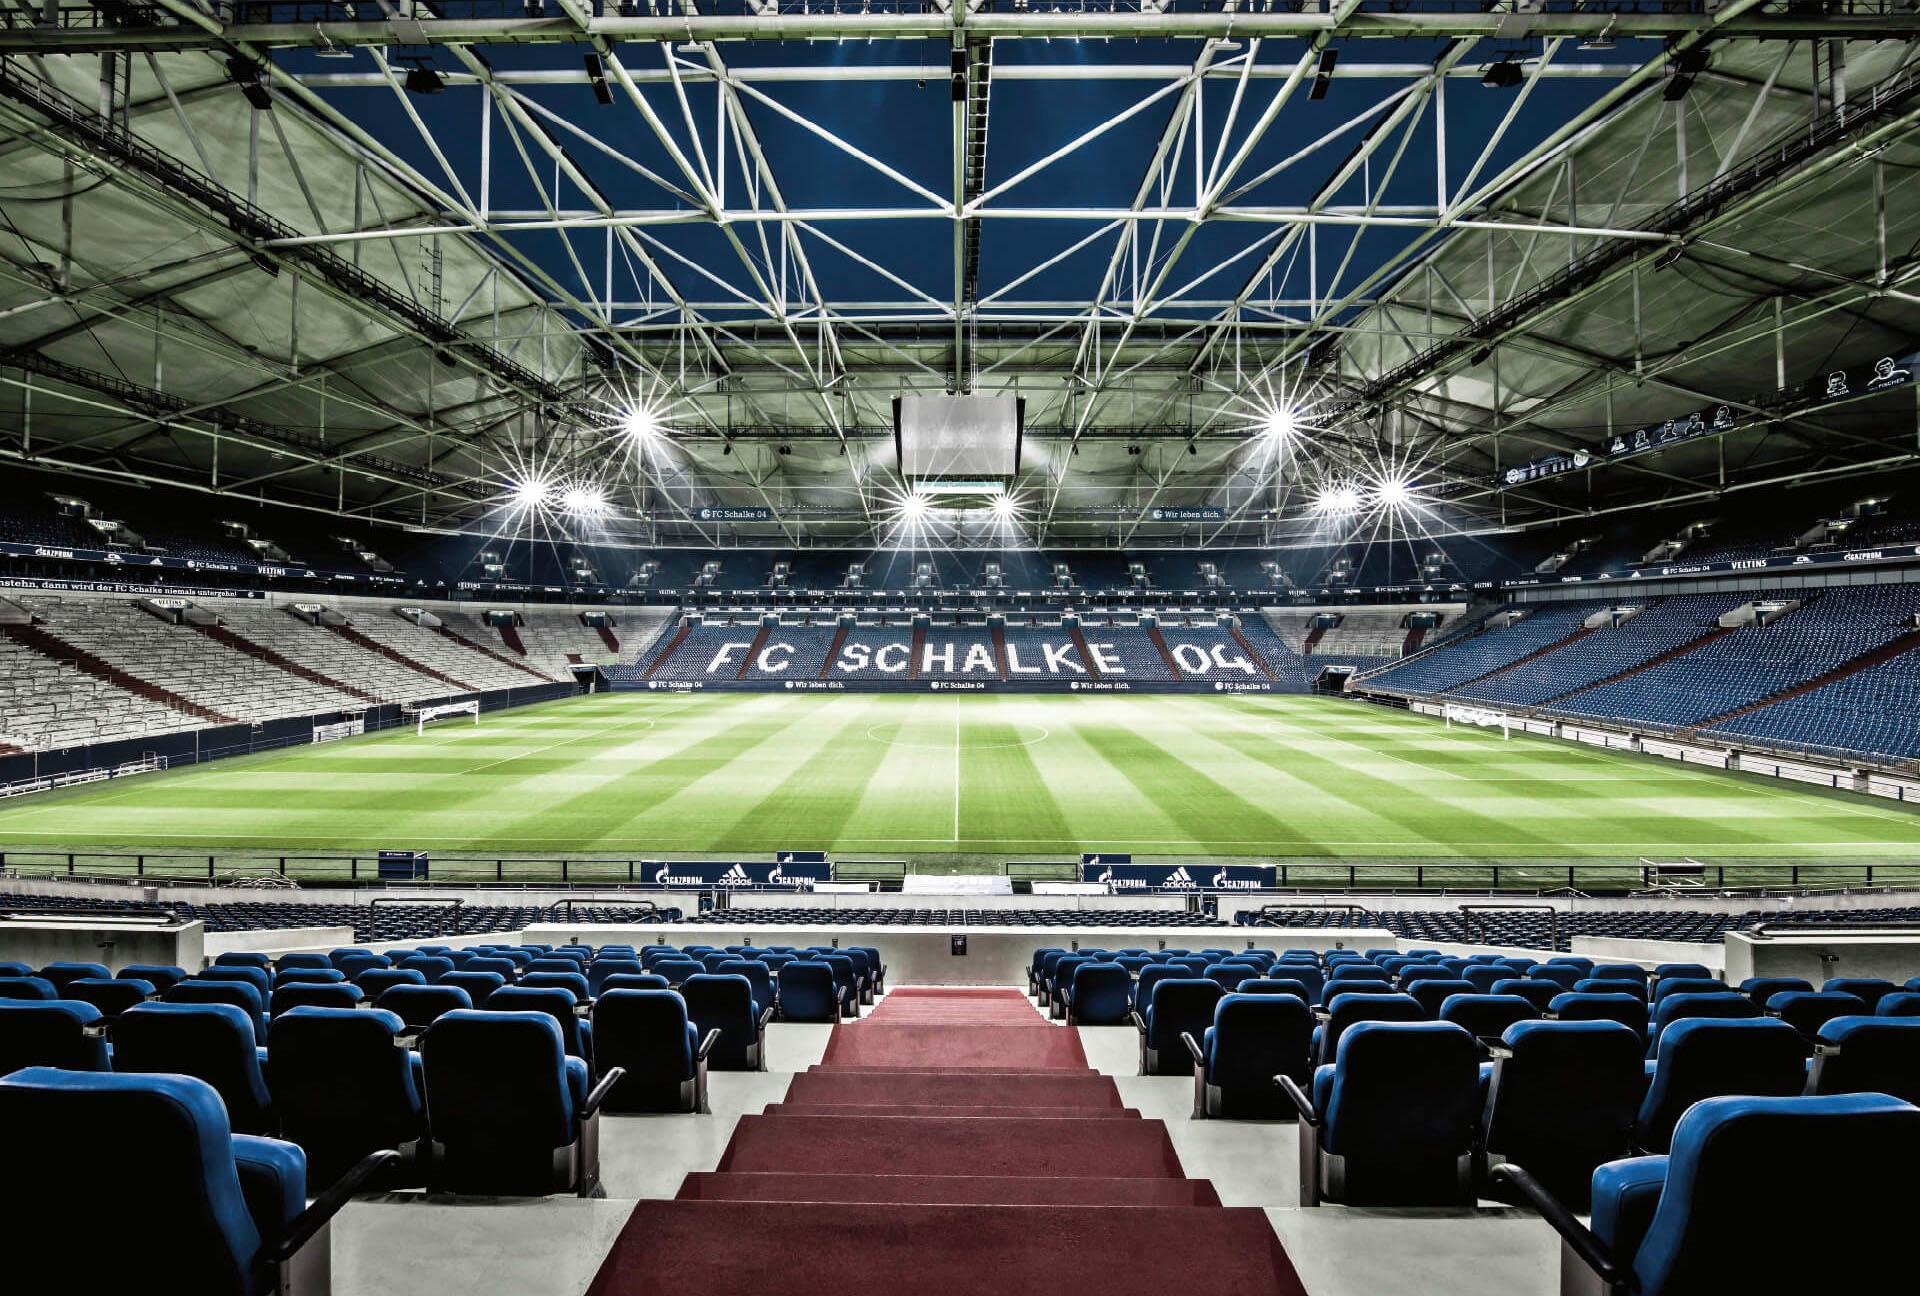 Vliestapete Schalke 04 Arena Tribüne bunt Fototapeten Tapeten Bauen Renovieren